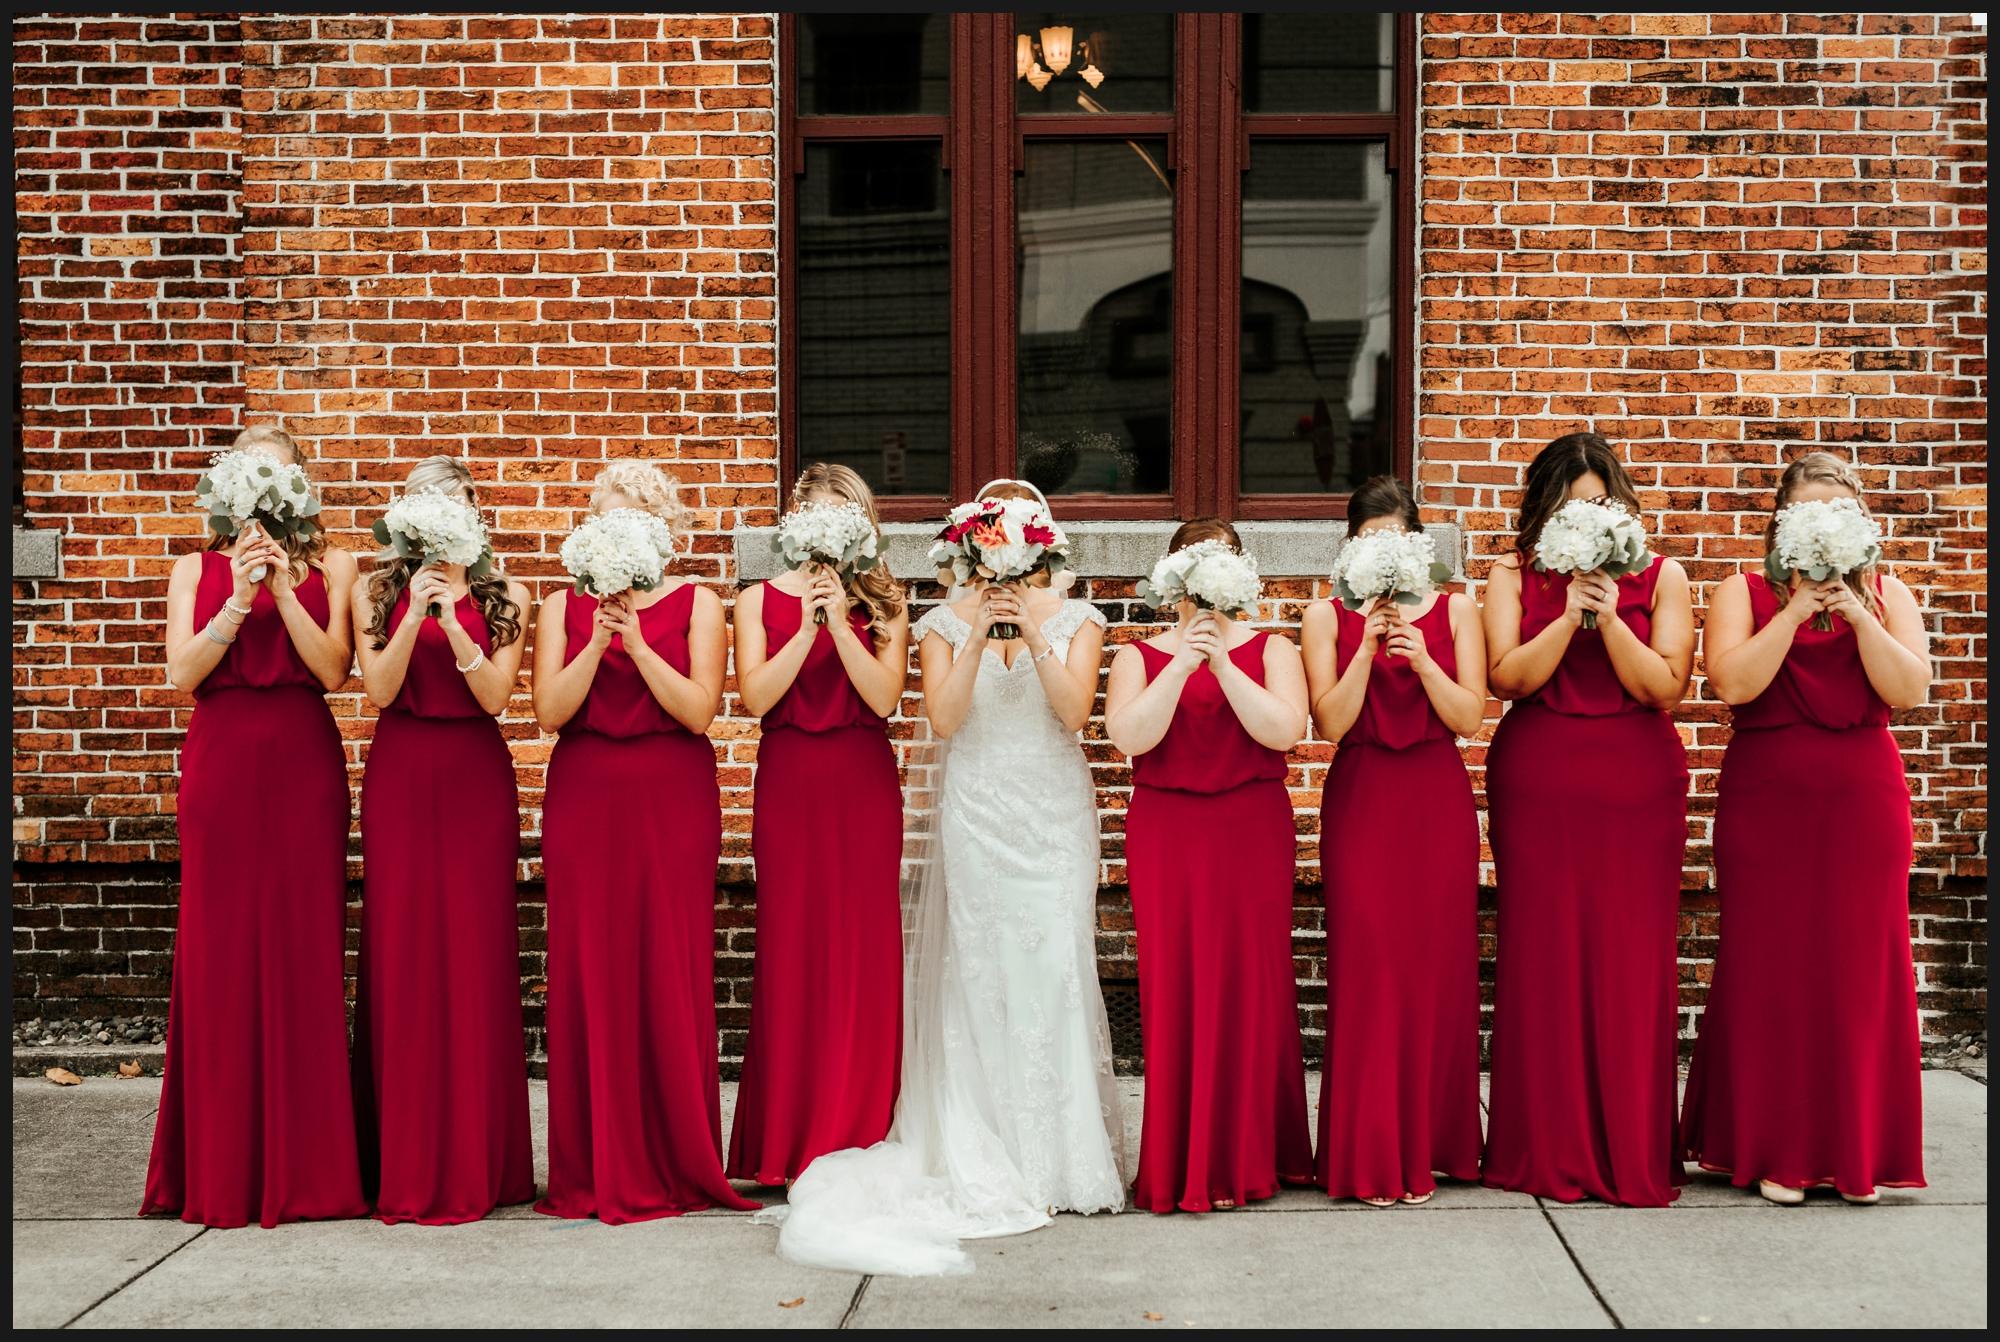 Orlando-Wedding-Photographer-destination-wedding-photographer-florida-wedding-photographer-bohemian-wedding-photographer_0610.jpg